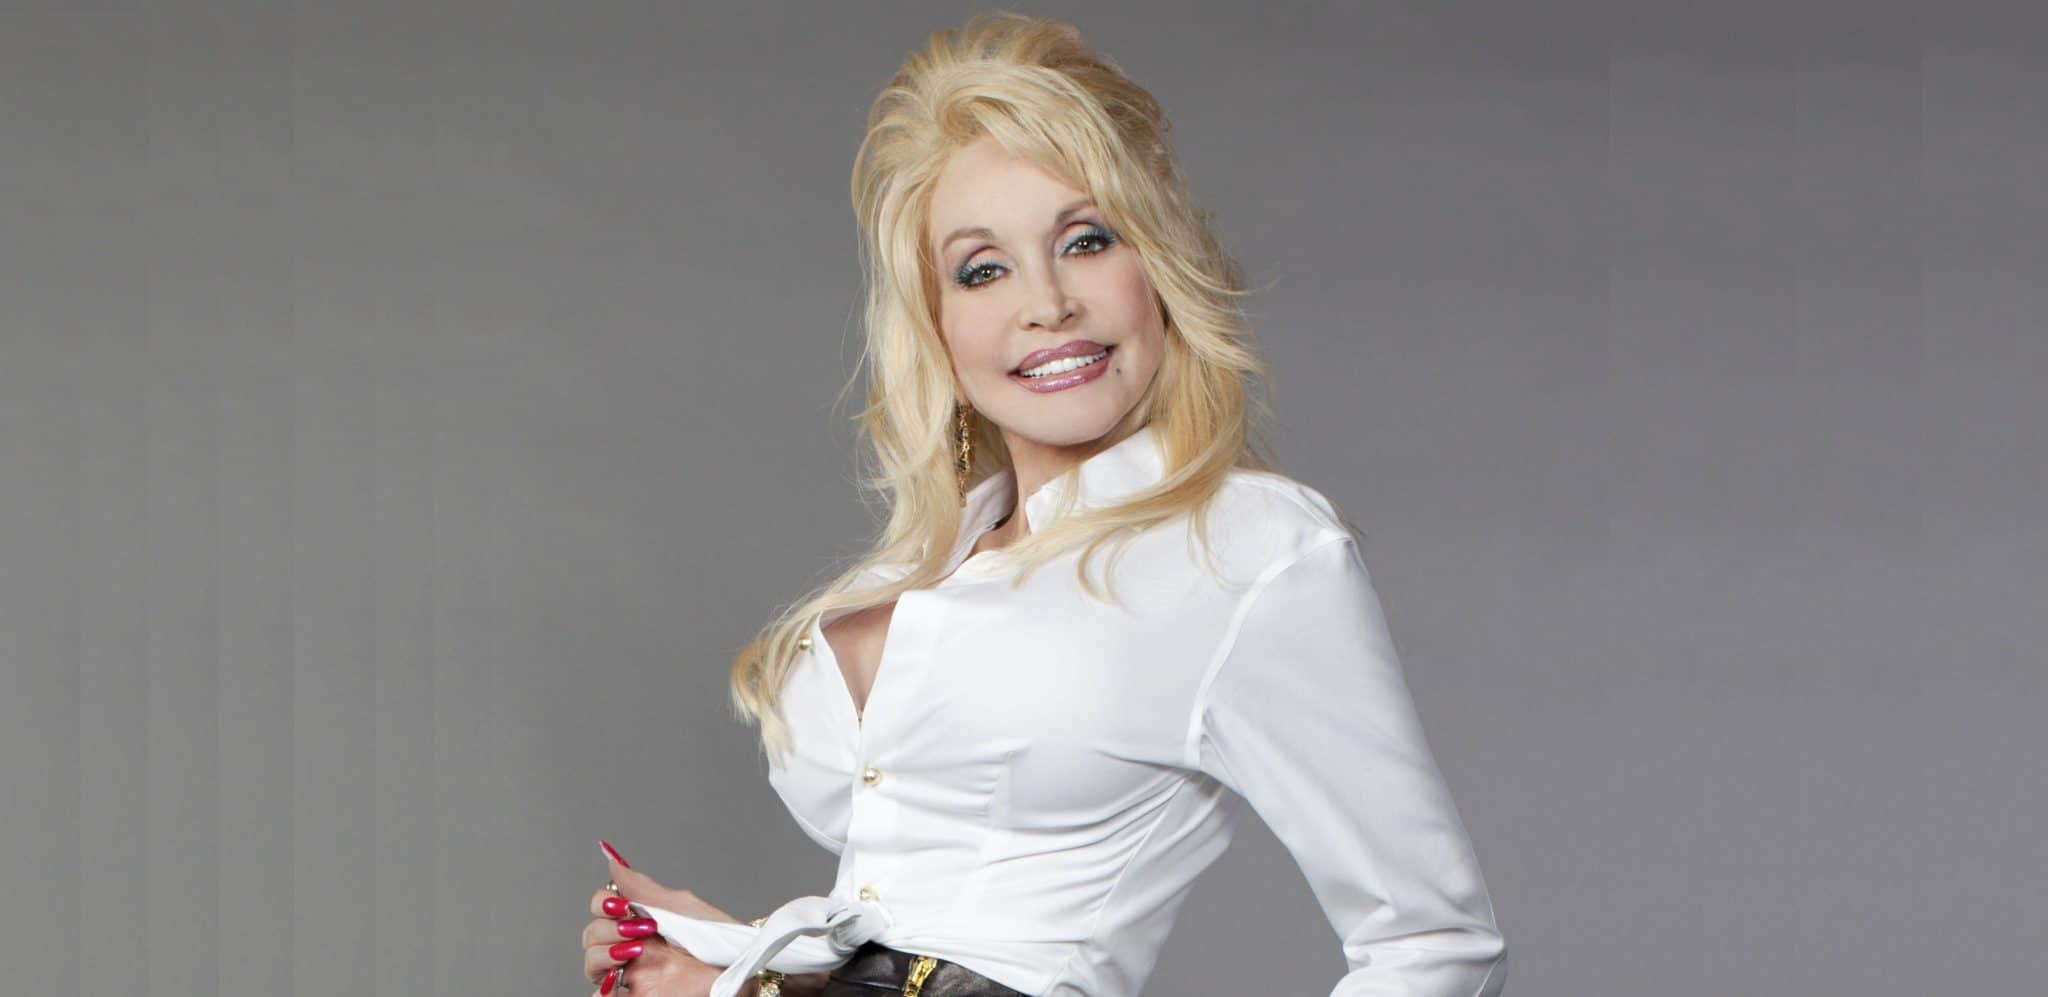 Dolly Parton (Долли Партон): Биография певицы